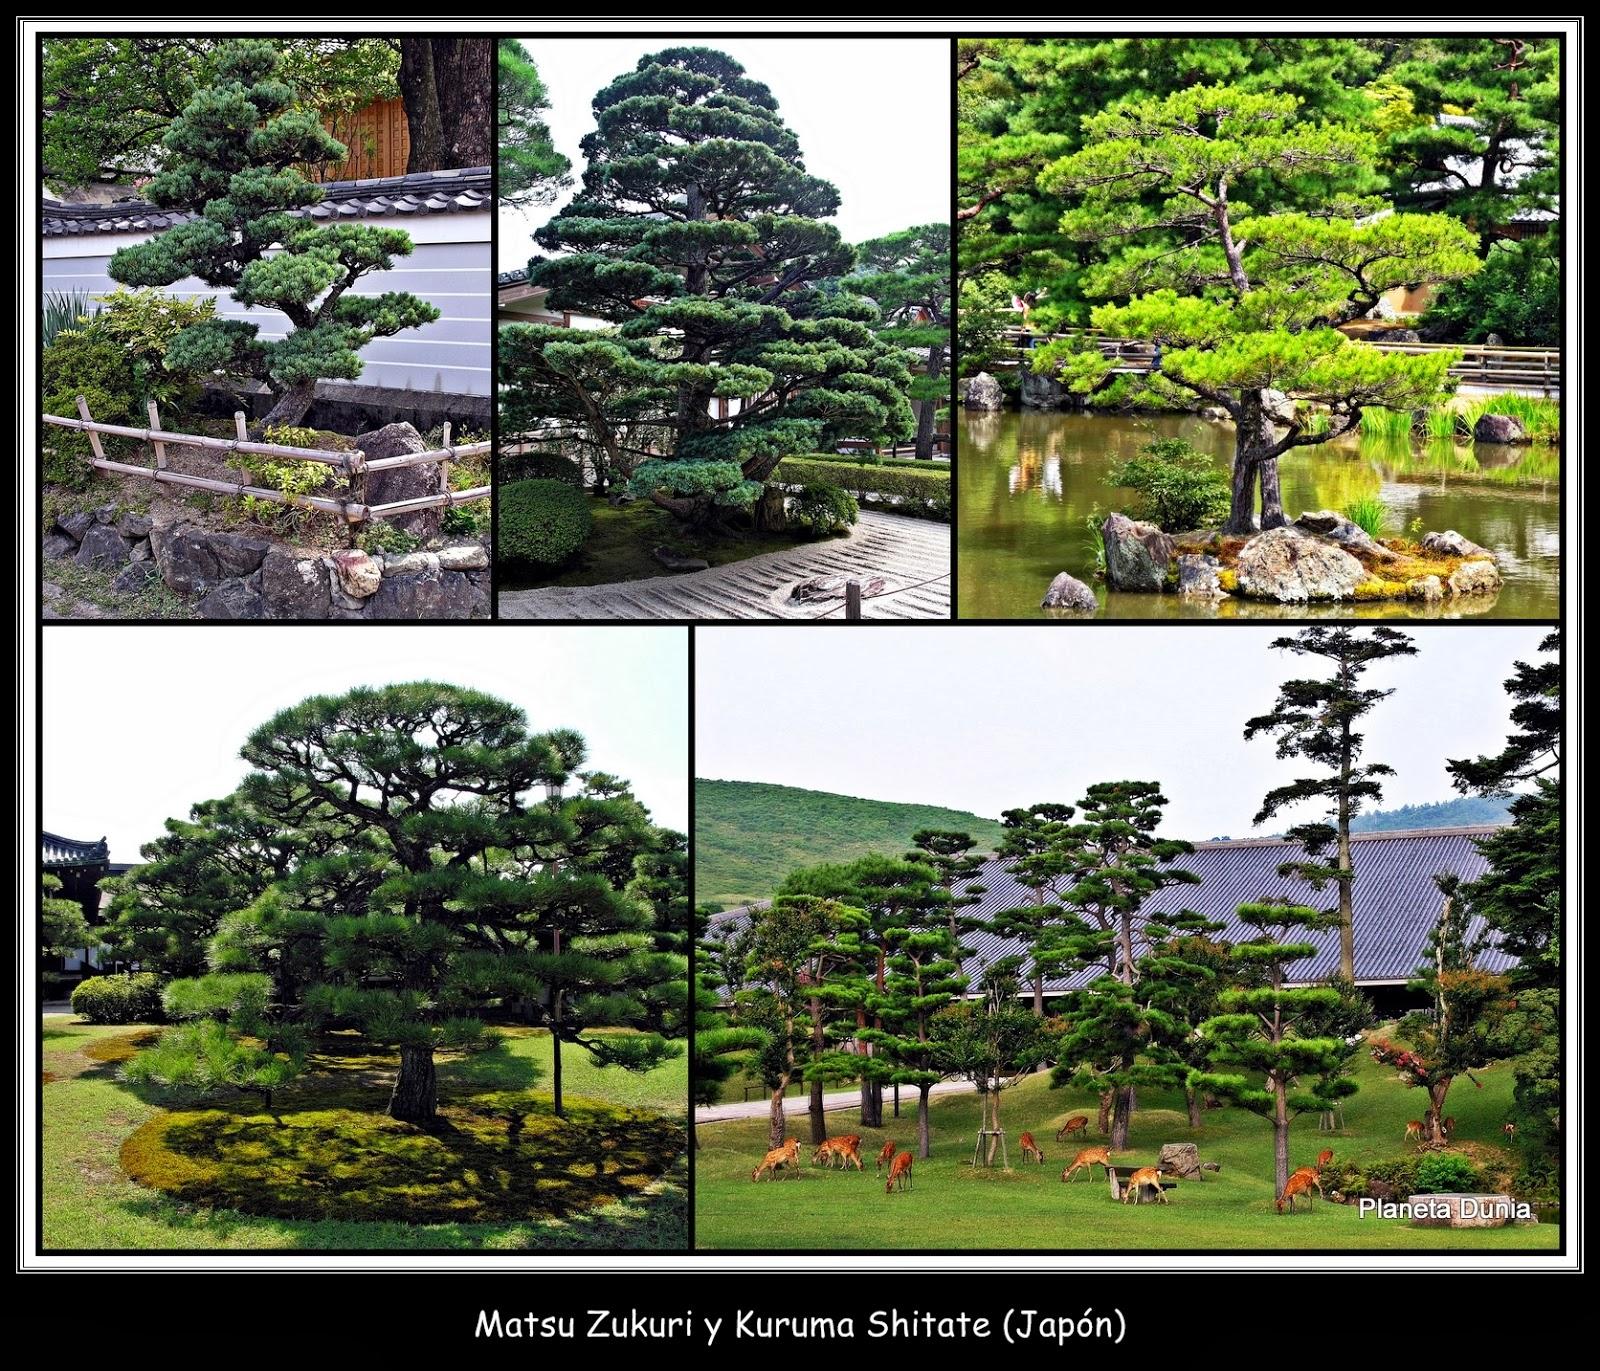 Planeta dunia rboles de un jard n japon s for Arboles jardin japones